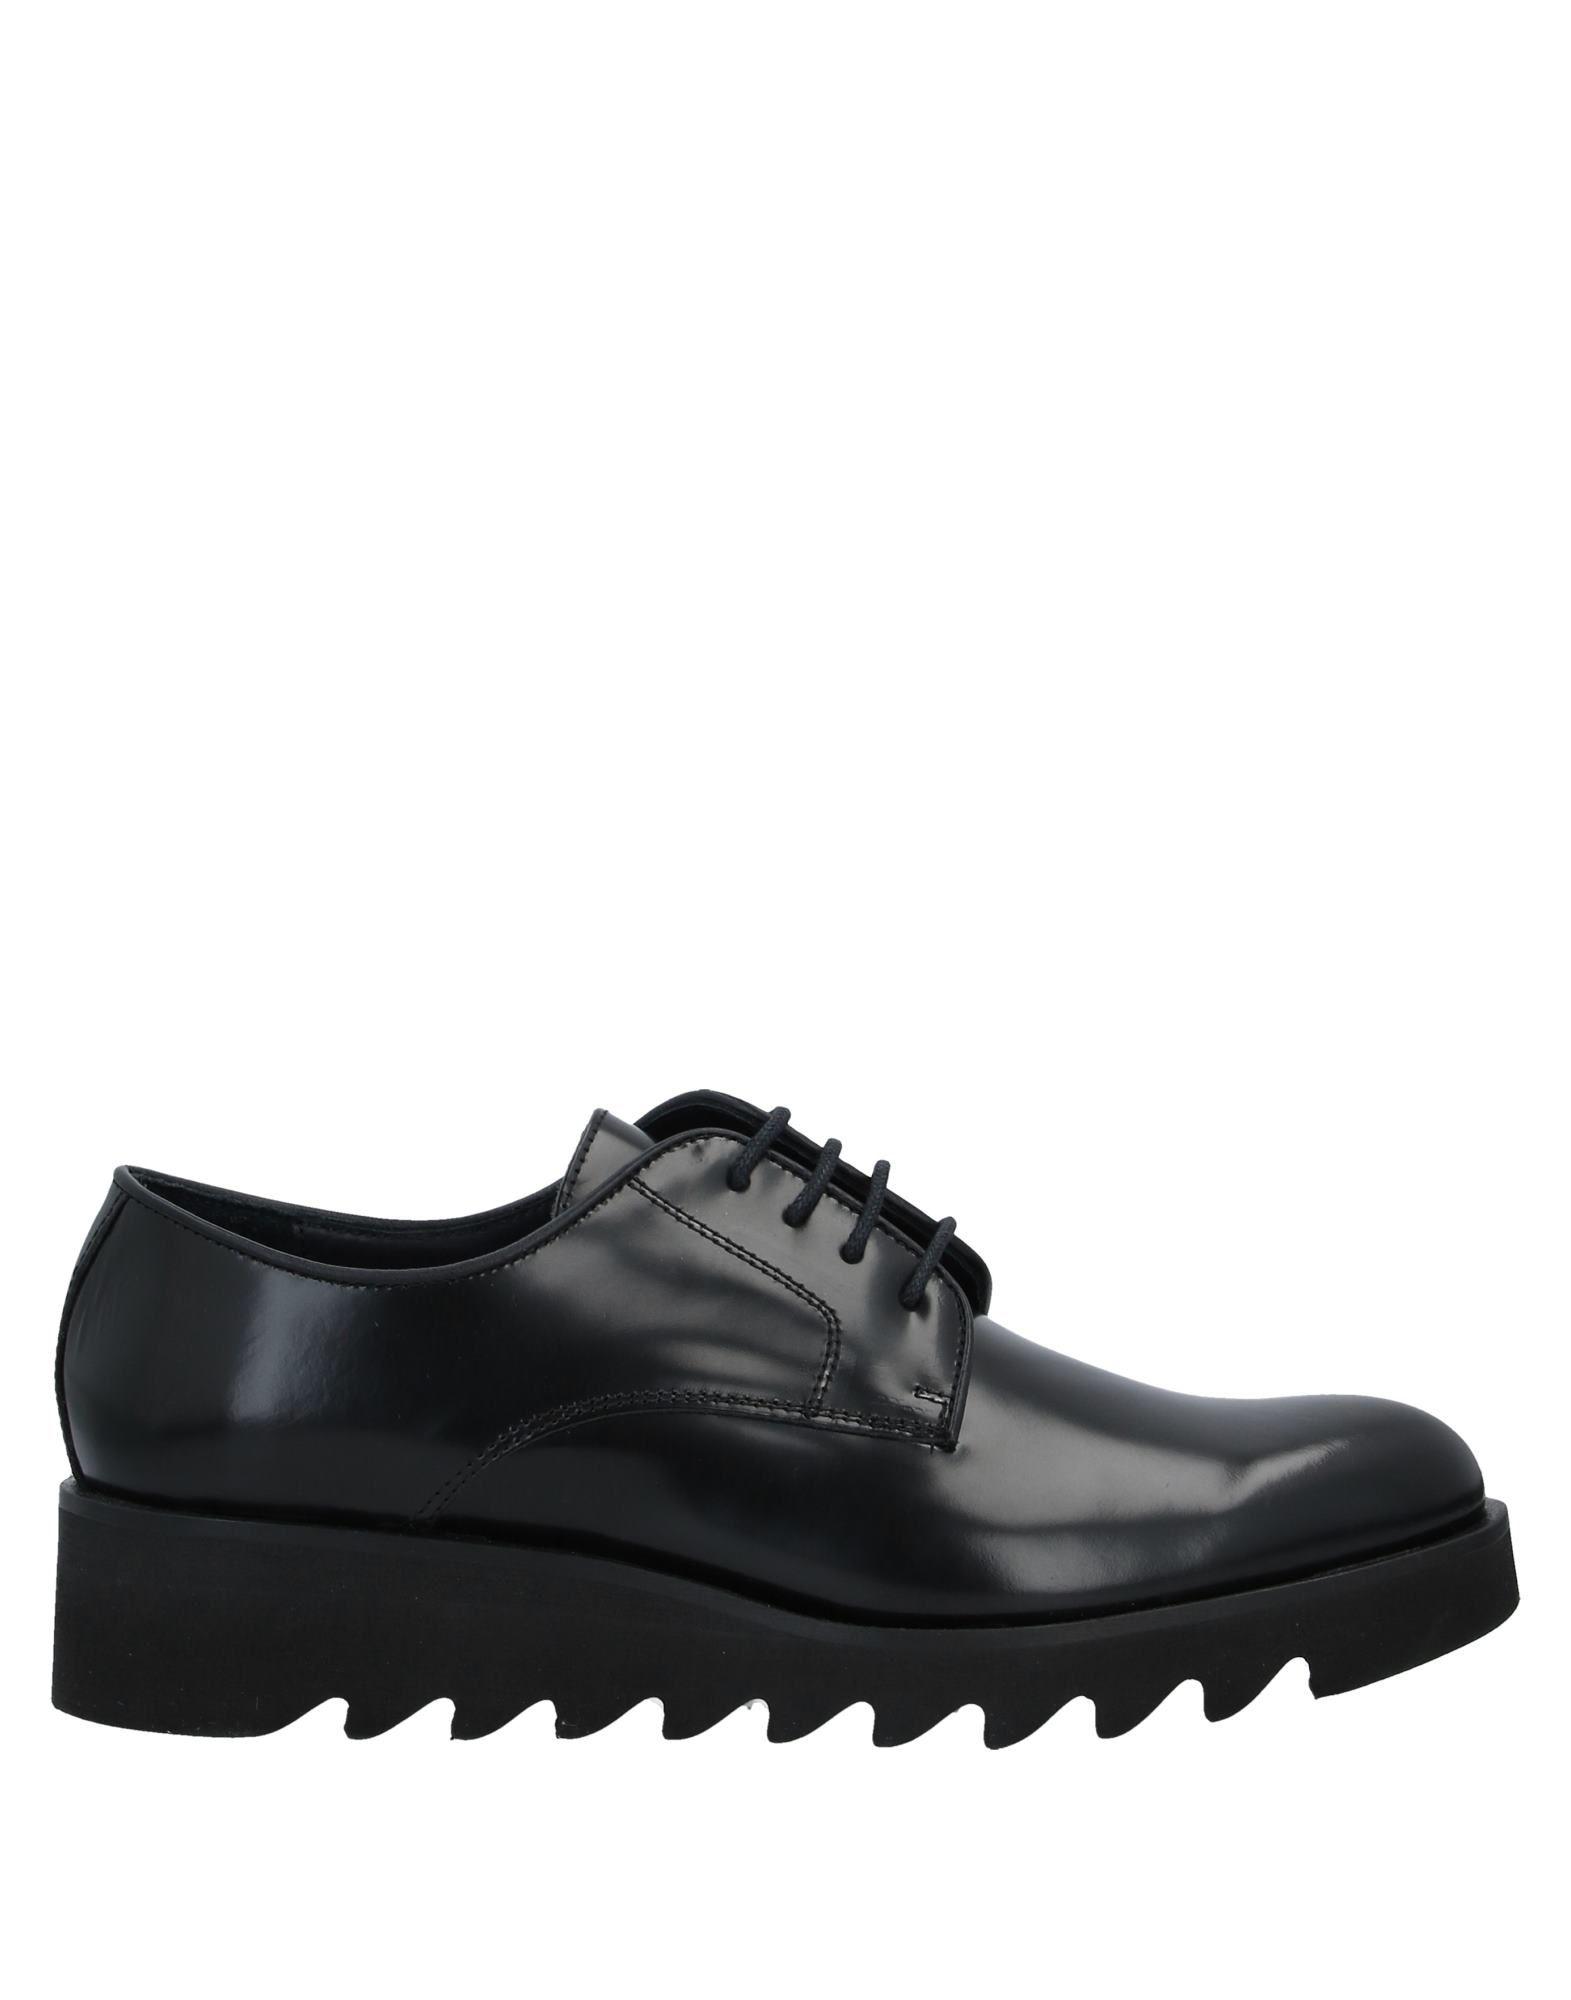 цена OFFICINE FIORENTINE Обувь на шнурках онлайн в 2017 году